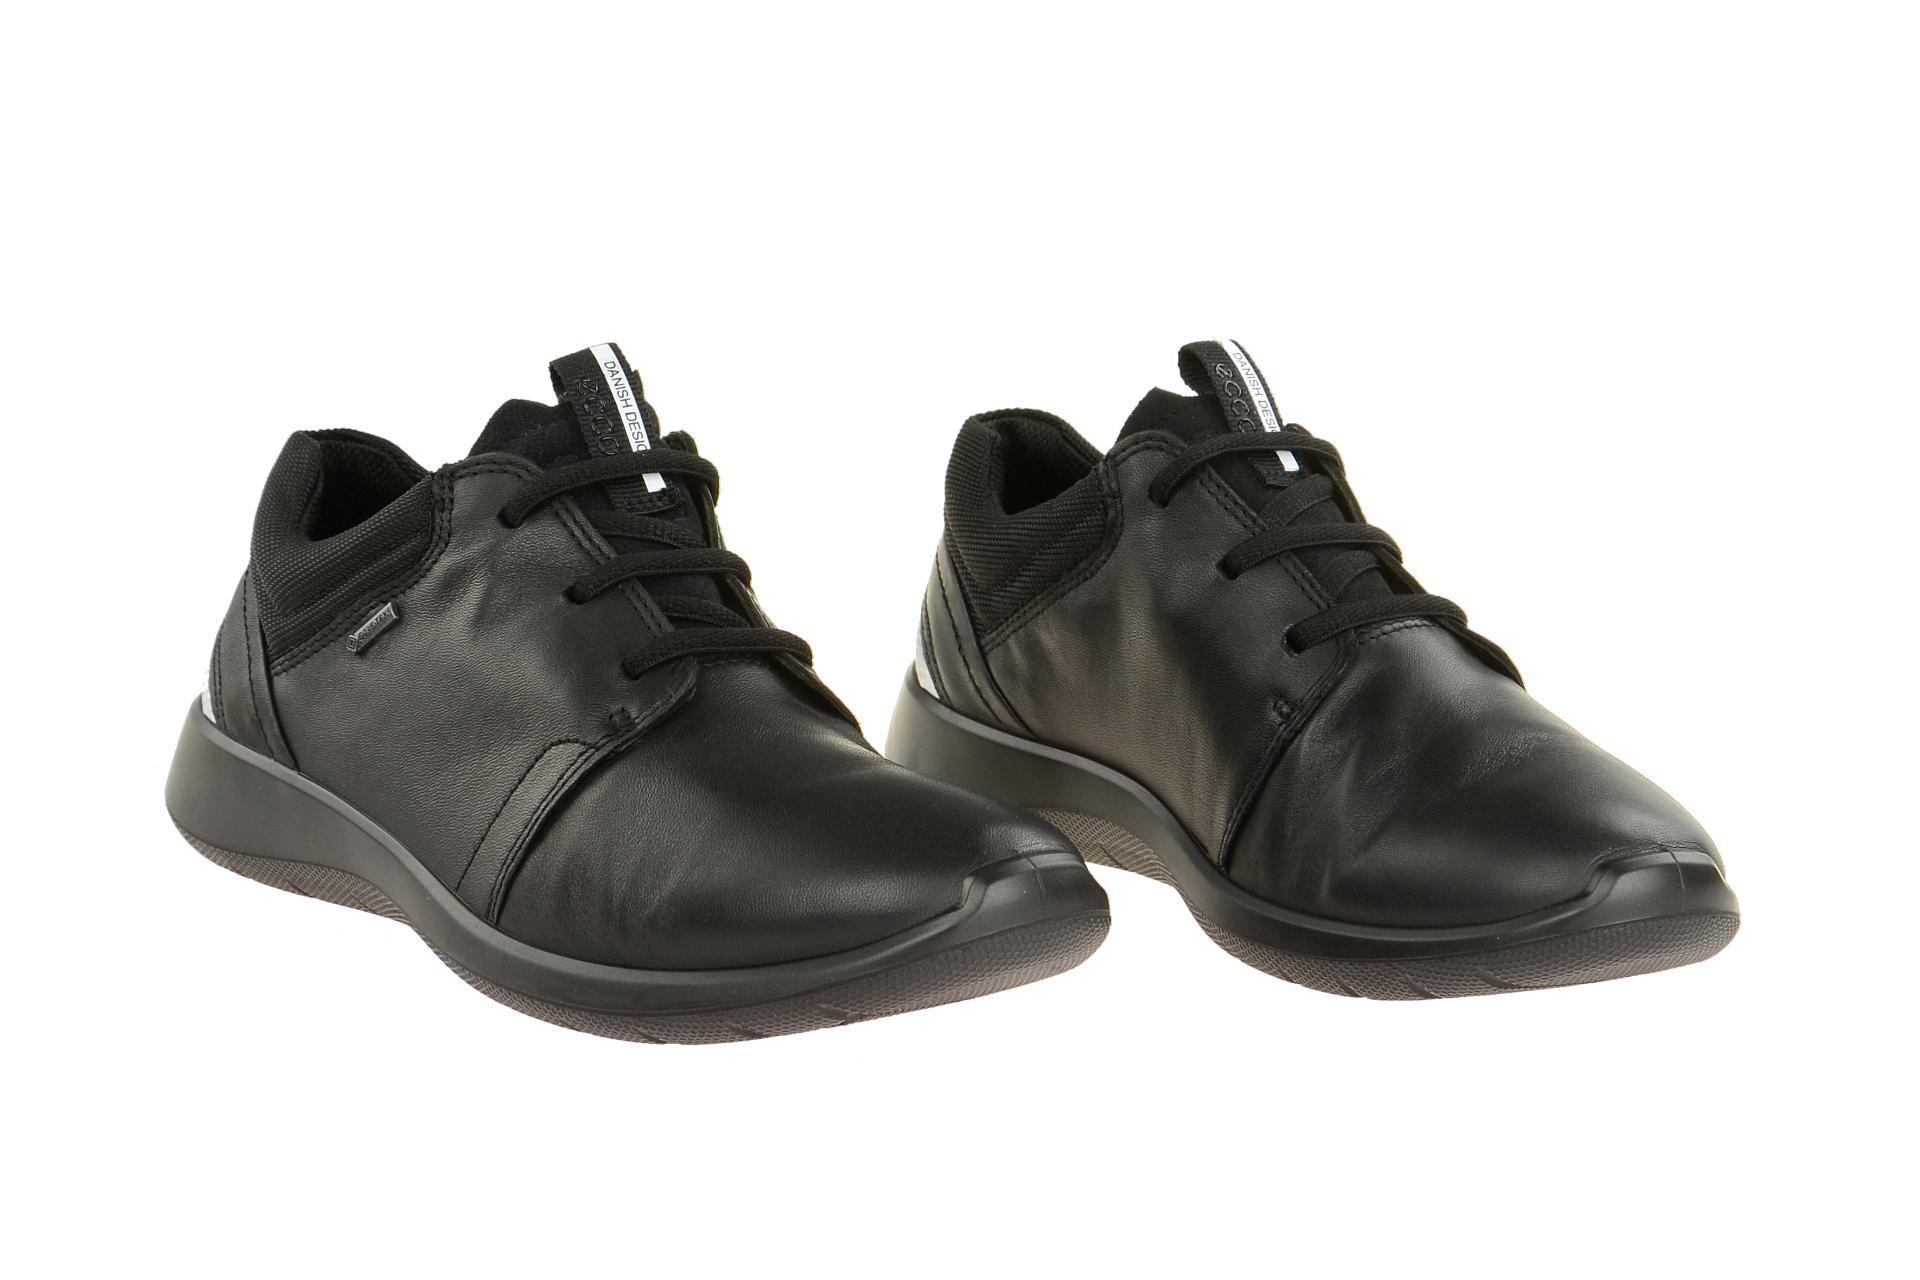 Reserviert NEUw Ecco Schuhe Halbschuhe Gr. 41, schwarz